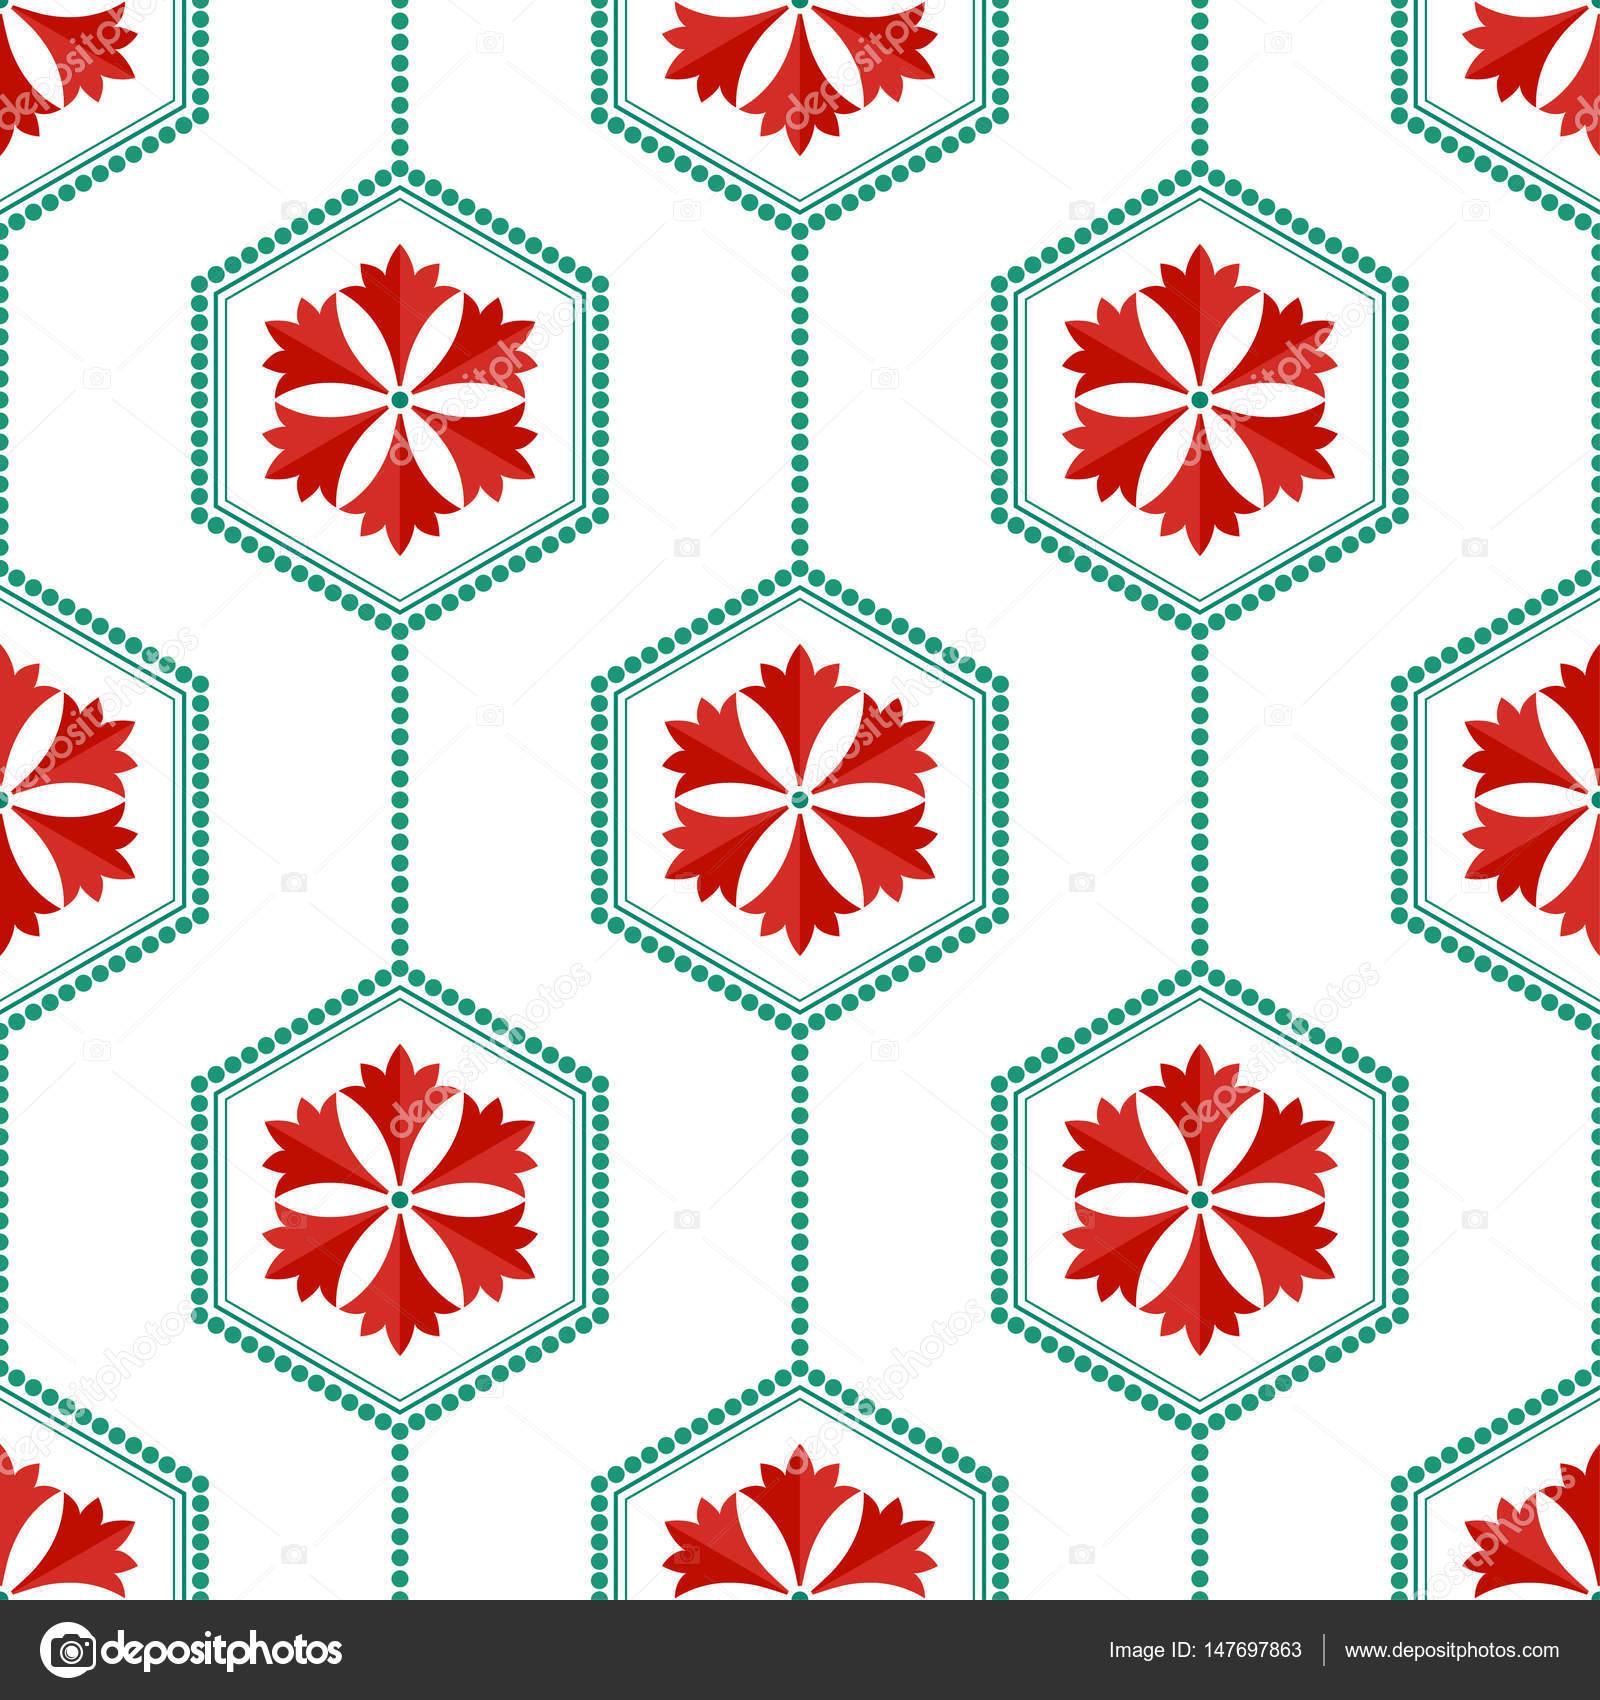 Картинки на рабочий стол islam 2592x1944 обложка quran